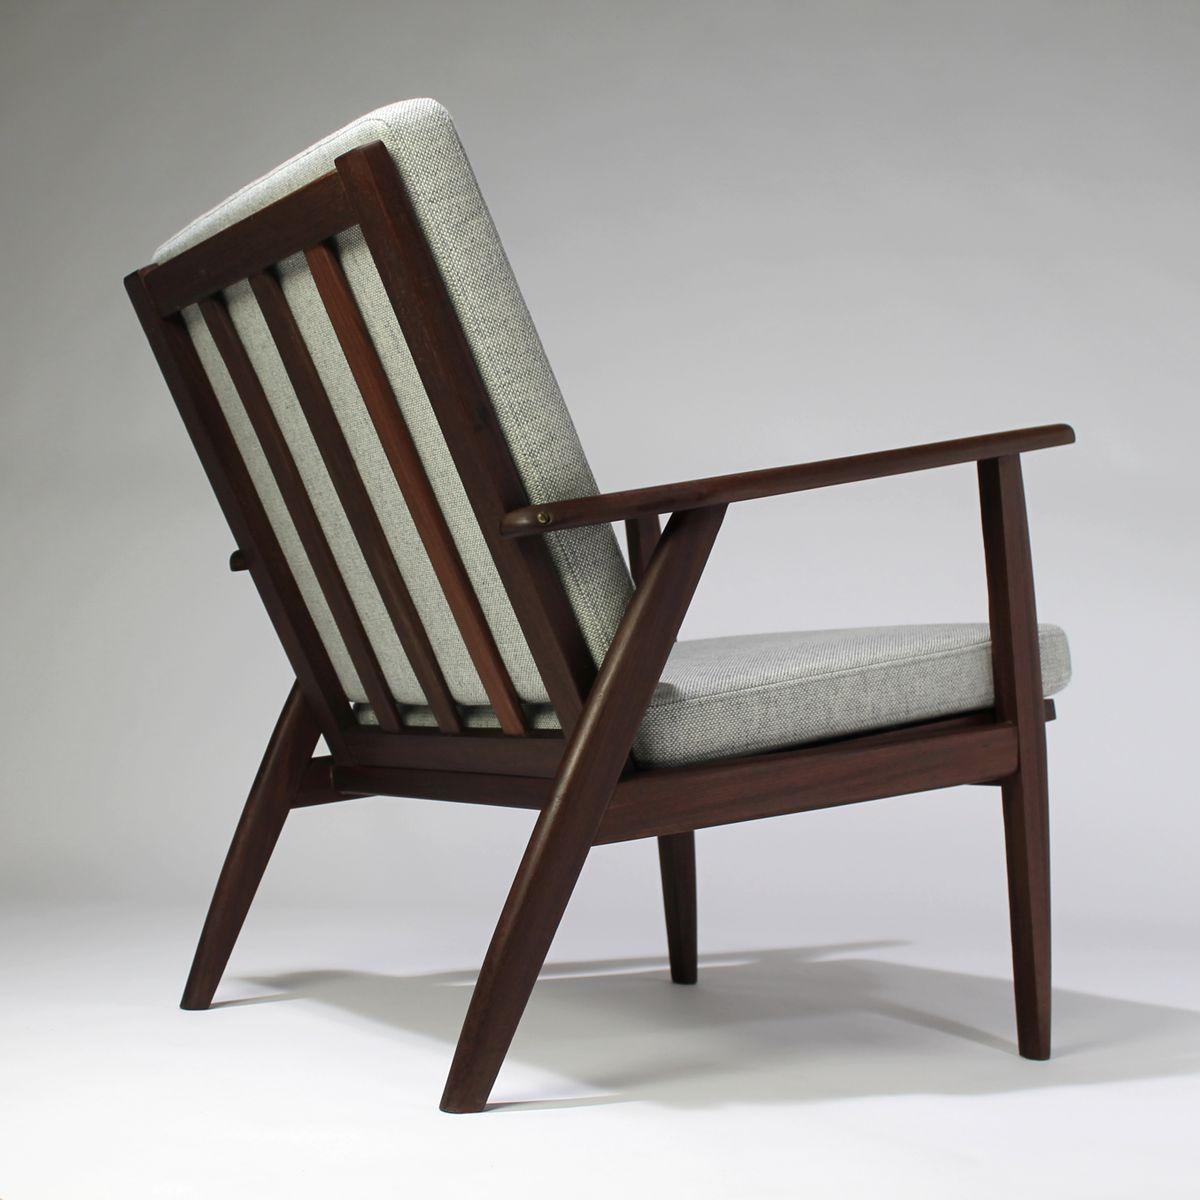 grauer d nischer sessel 1960er bei pamono kaufen. Black Bedroom Furniture Sets. Home Design Ideas